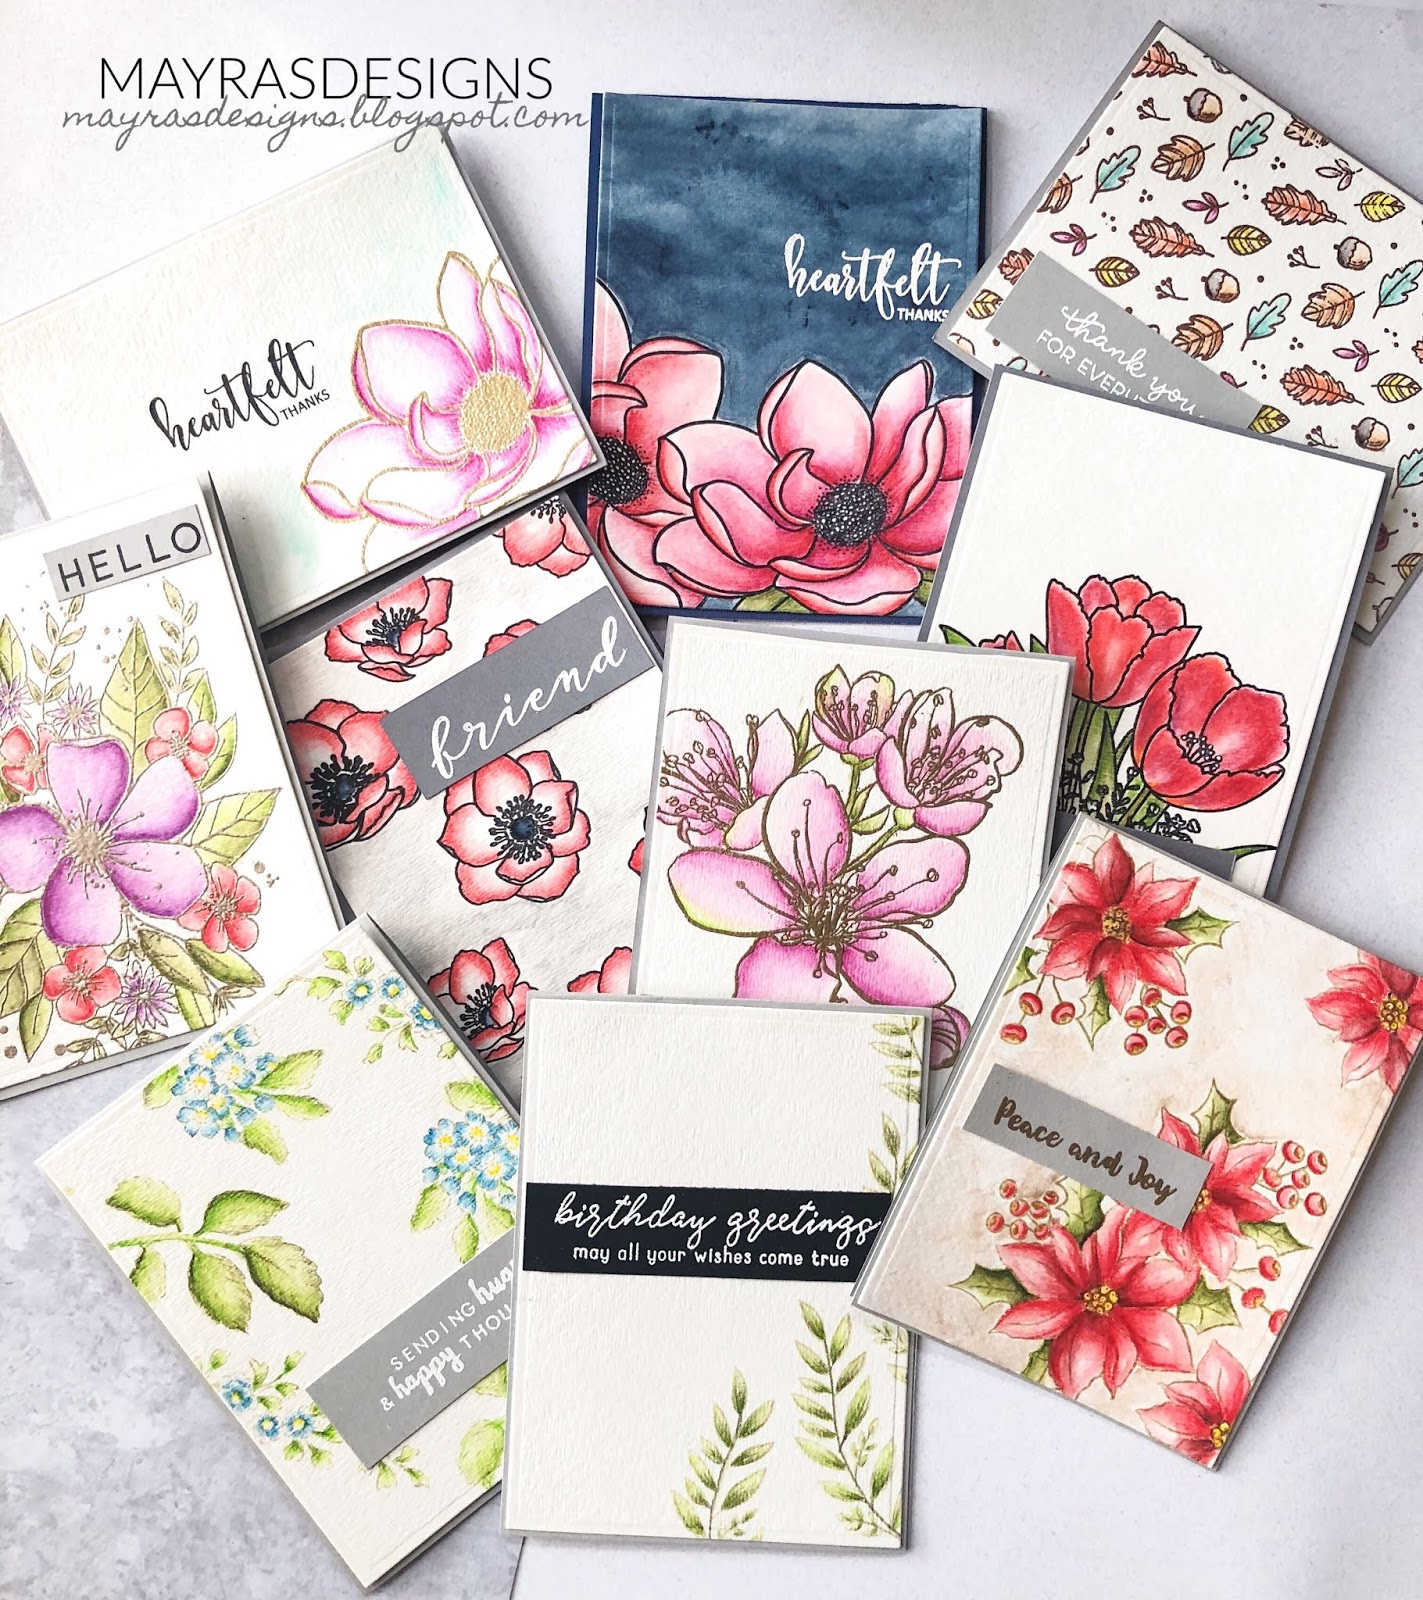 For My Cards We Were Showcasing Derwent Inktense Colour Pencils